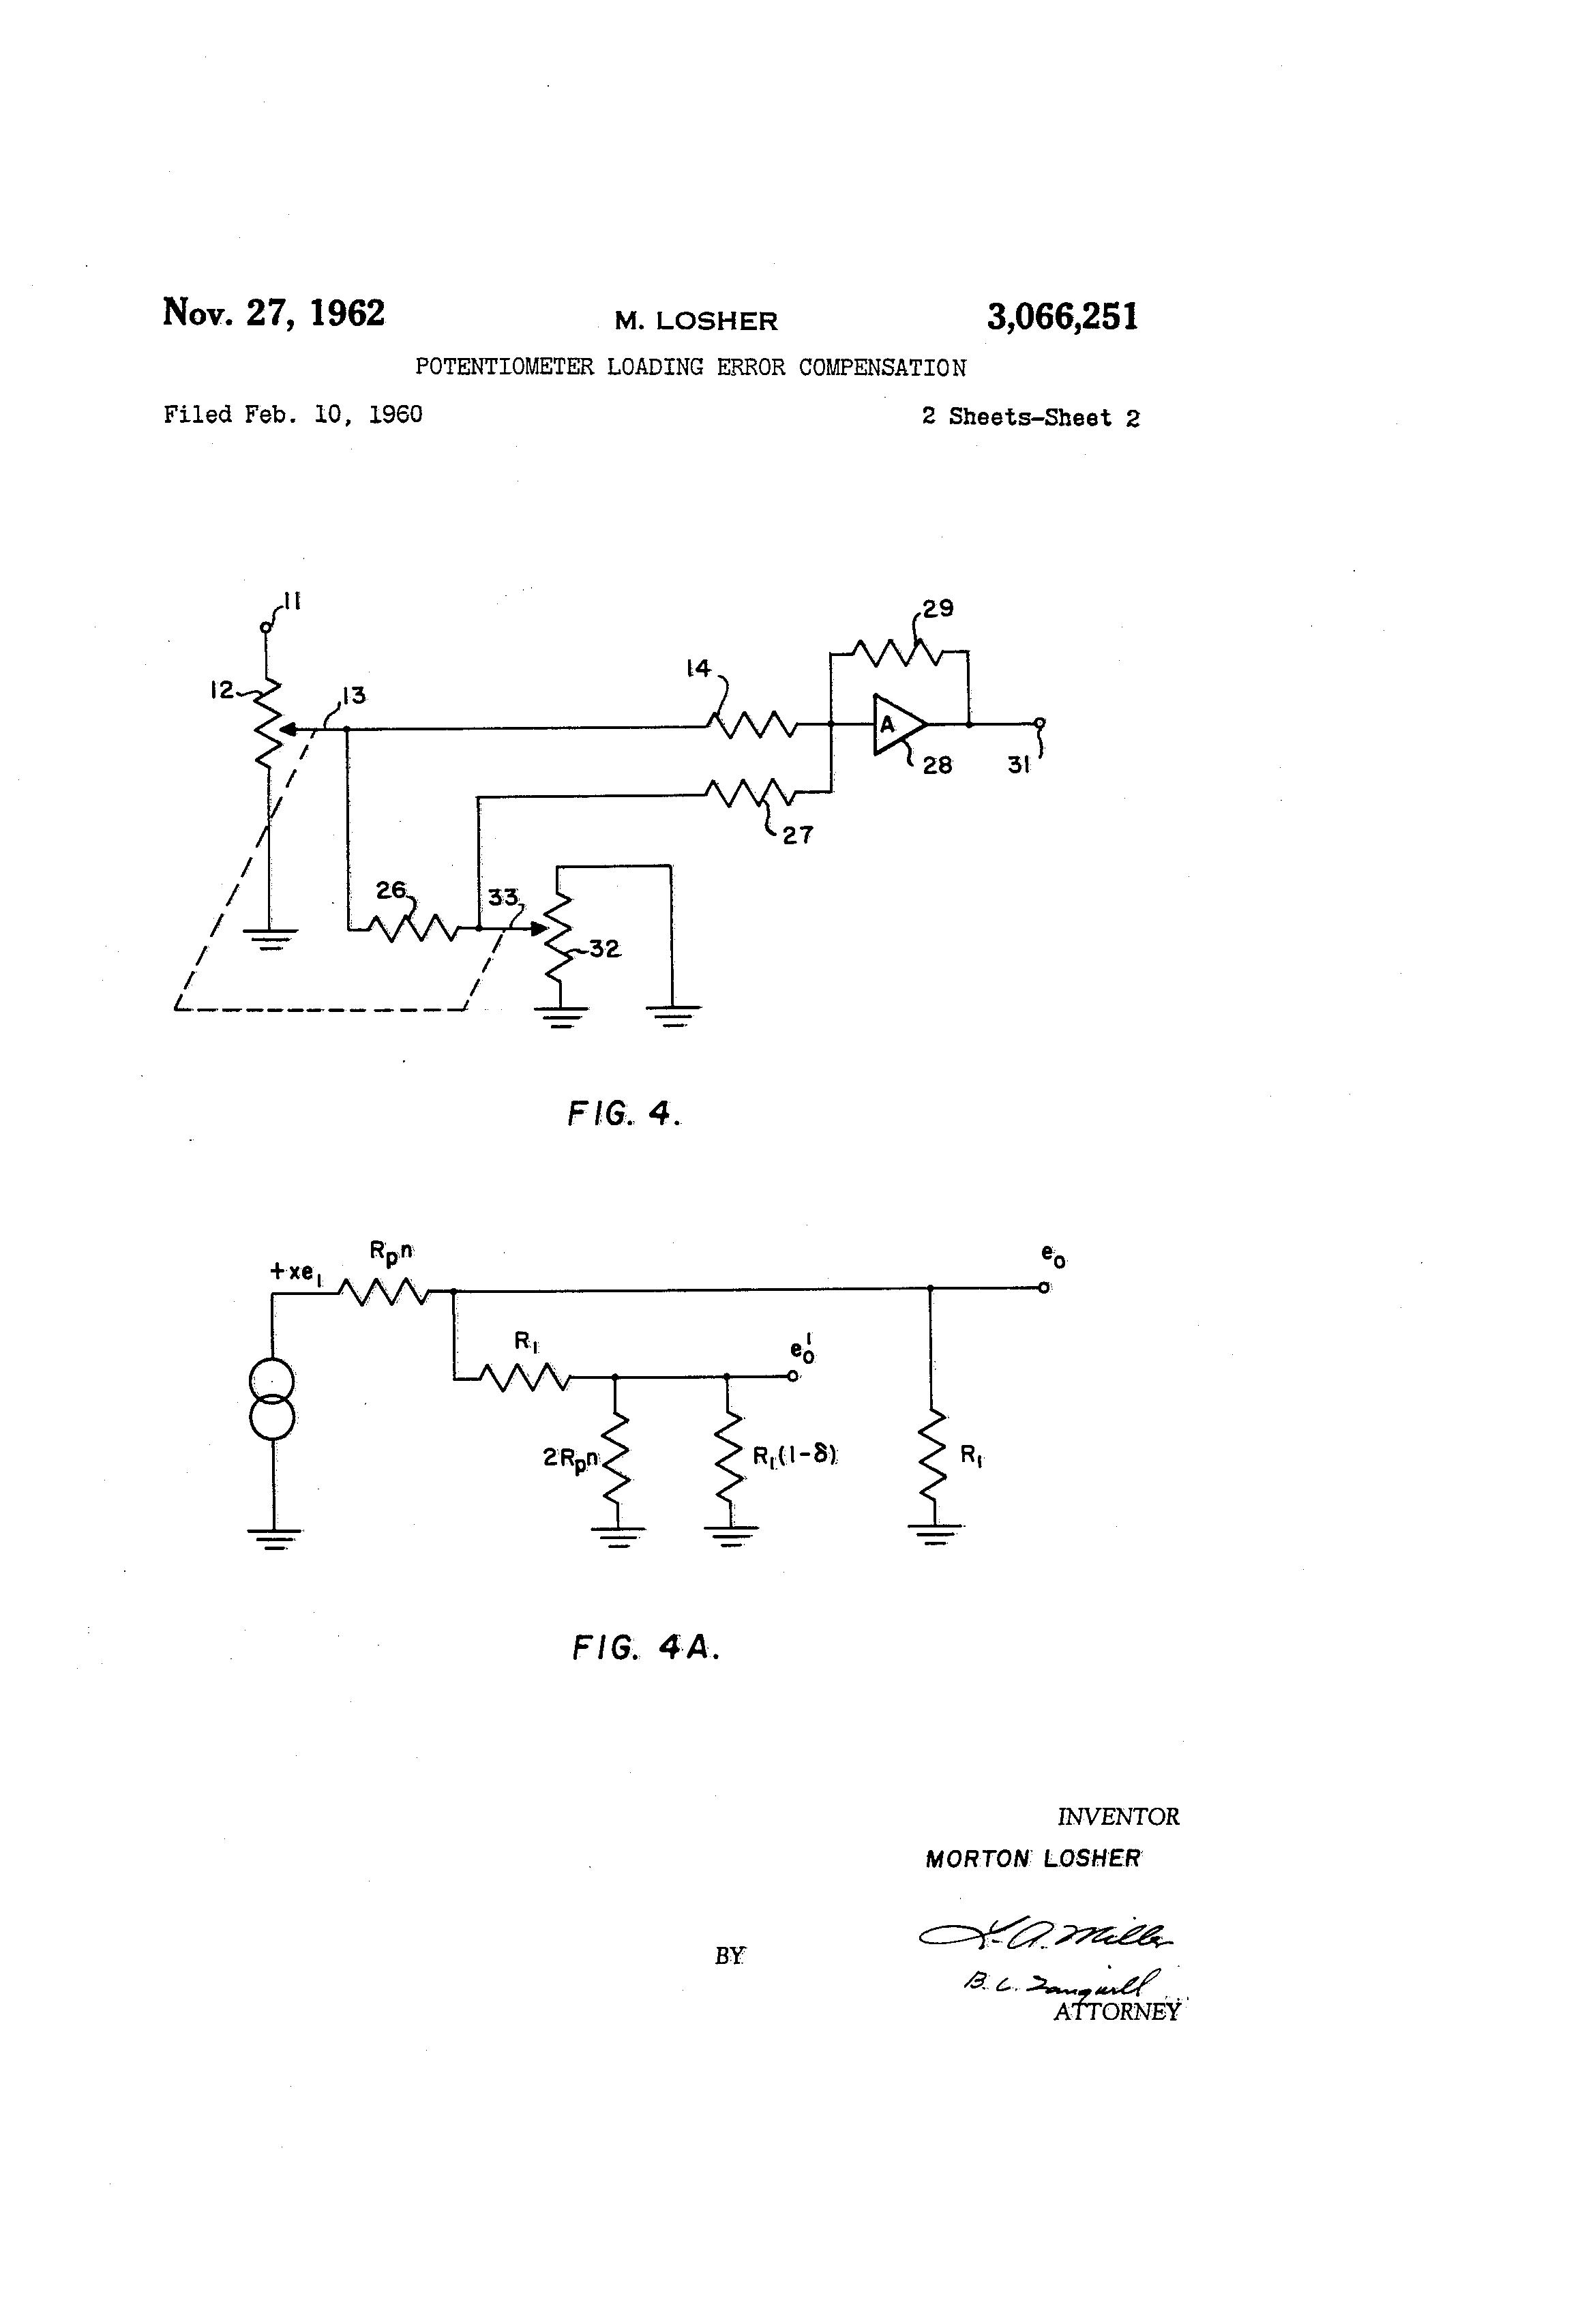 Amp Wiring Diagram 5 Pin Potentiometer Library